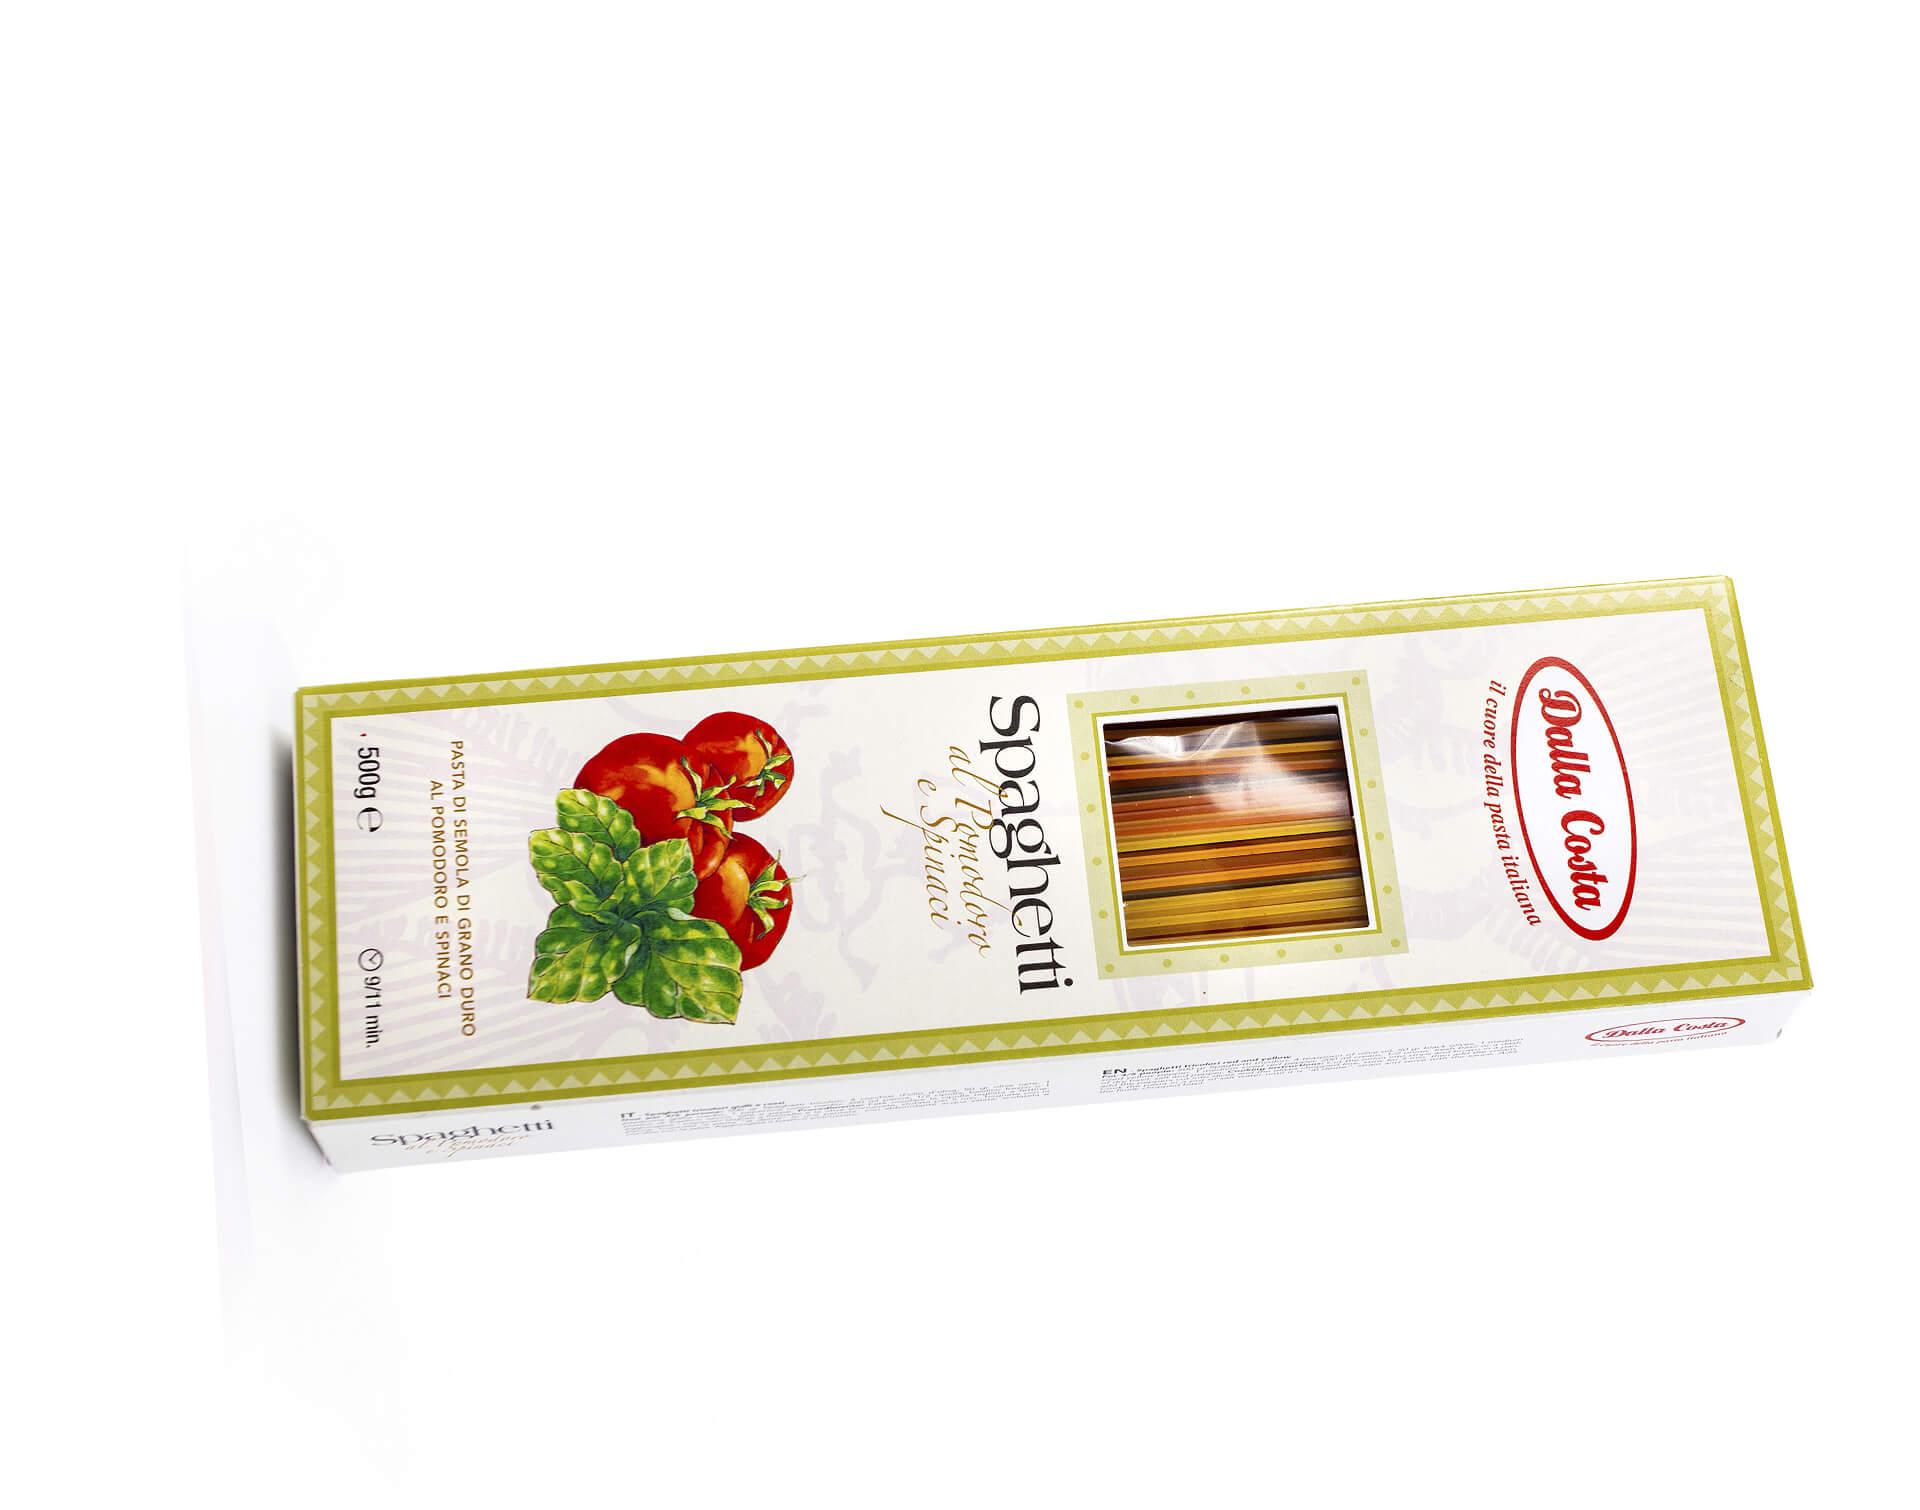 Спагетти со шпинатом и томатами Dalla Costa 500г